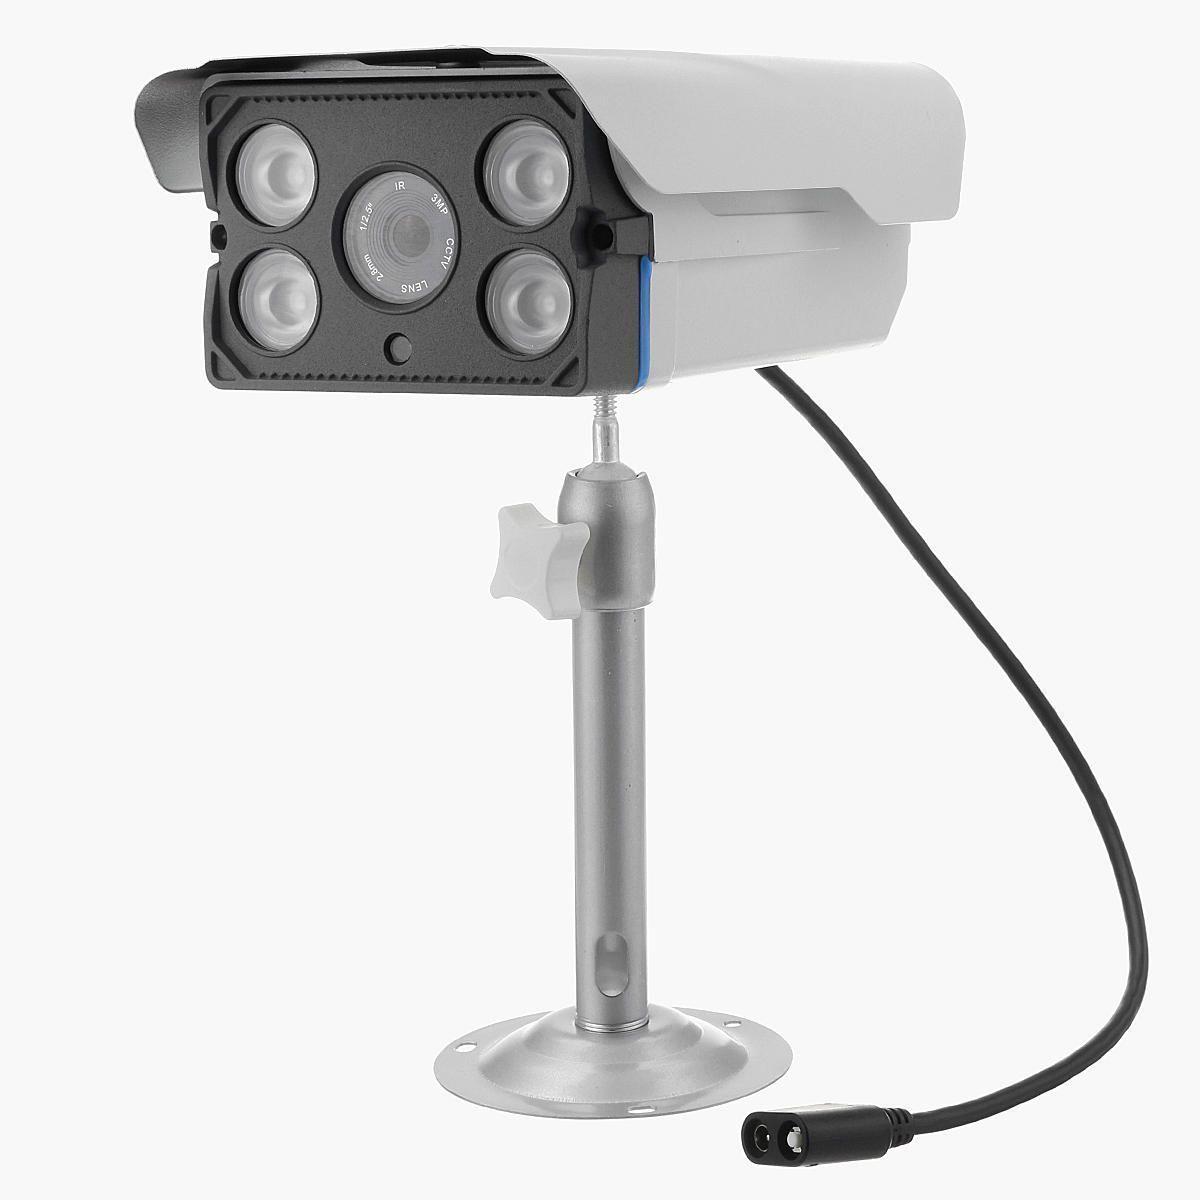 HD 720P Wireless Camera Outdoor Home Security Surveillance Video ...